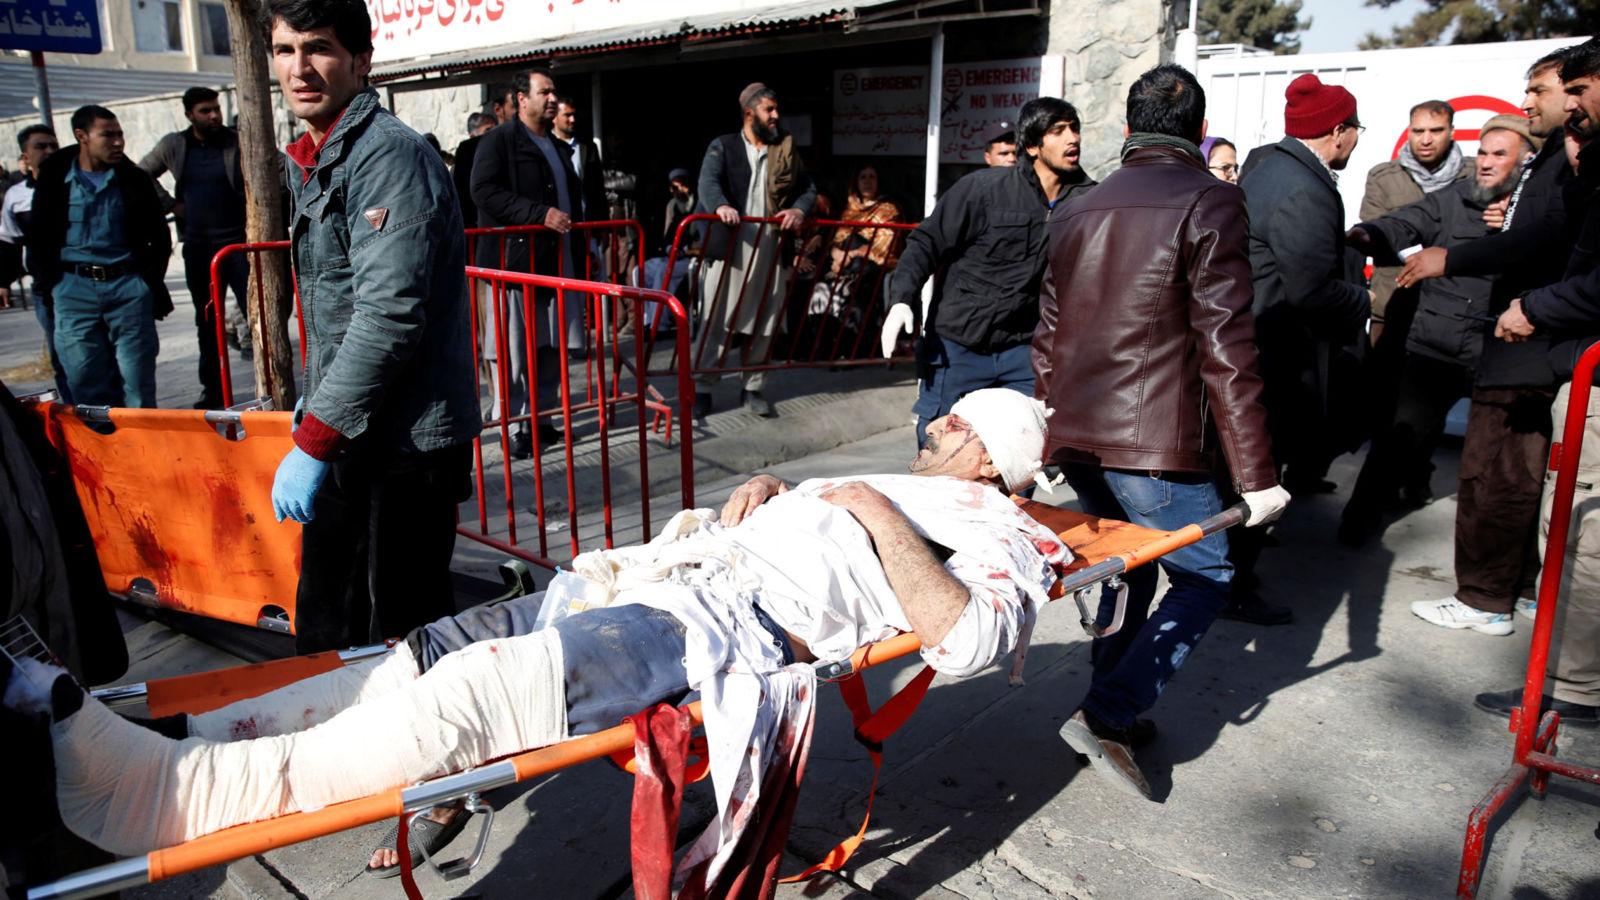 Suicide bomber driving ambulance kills 17